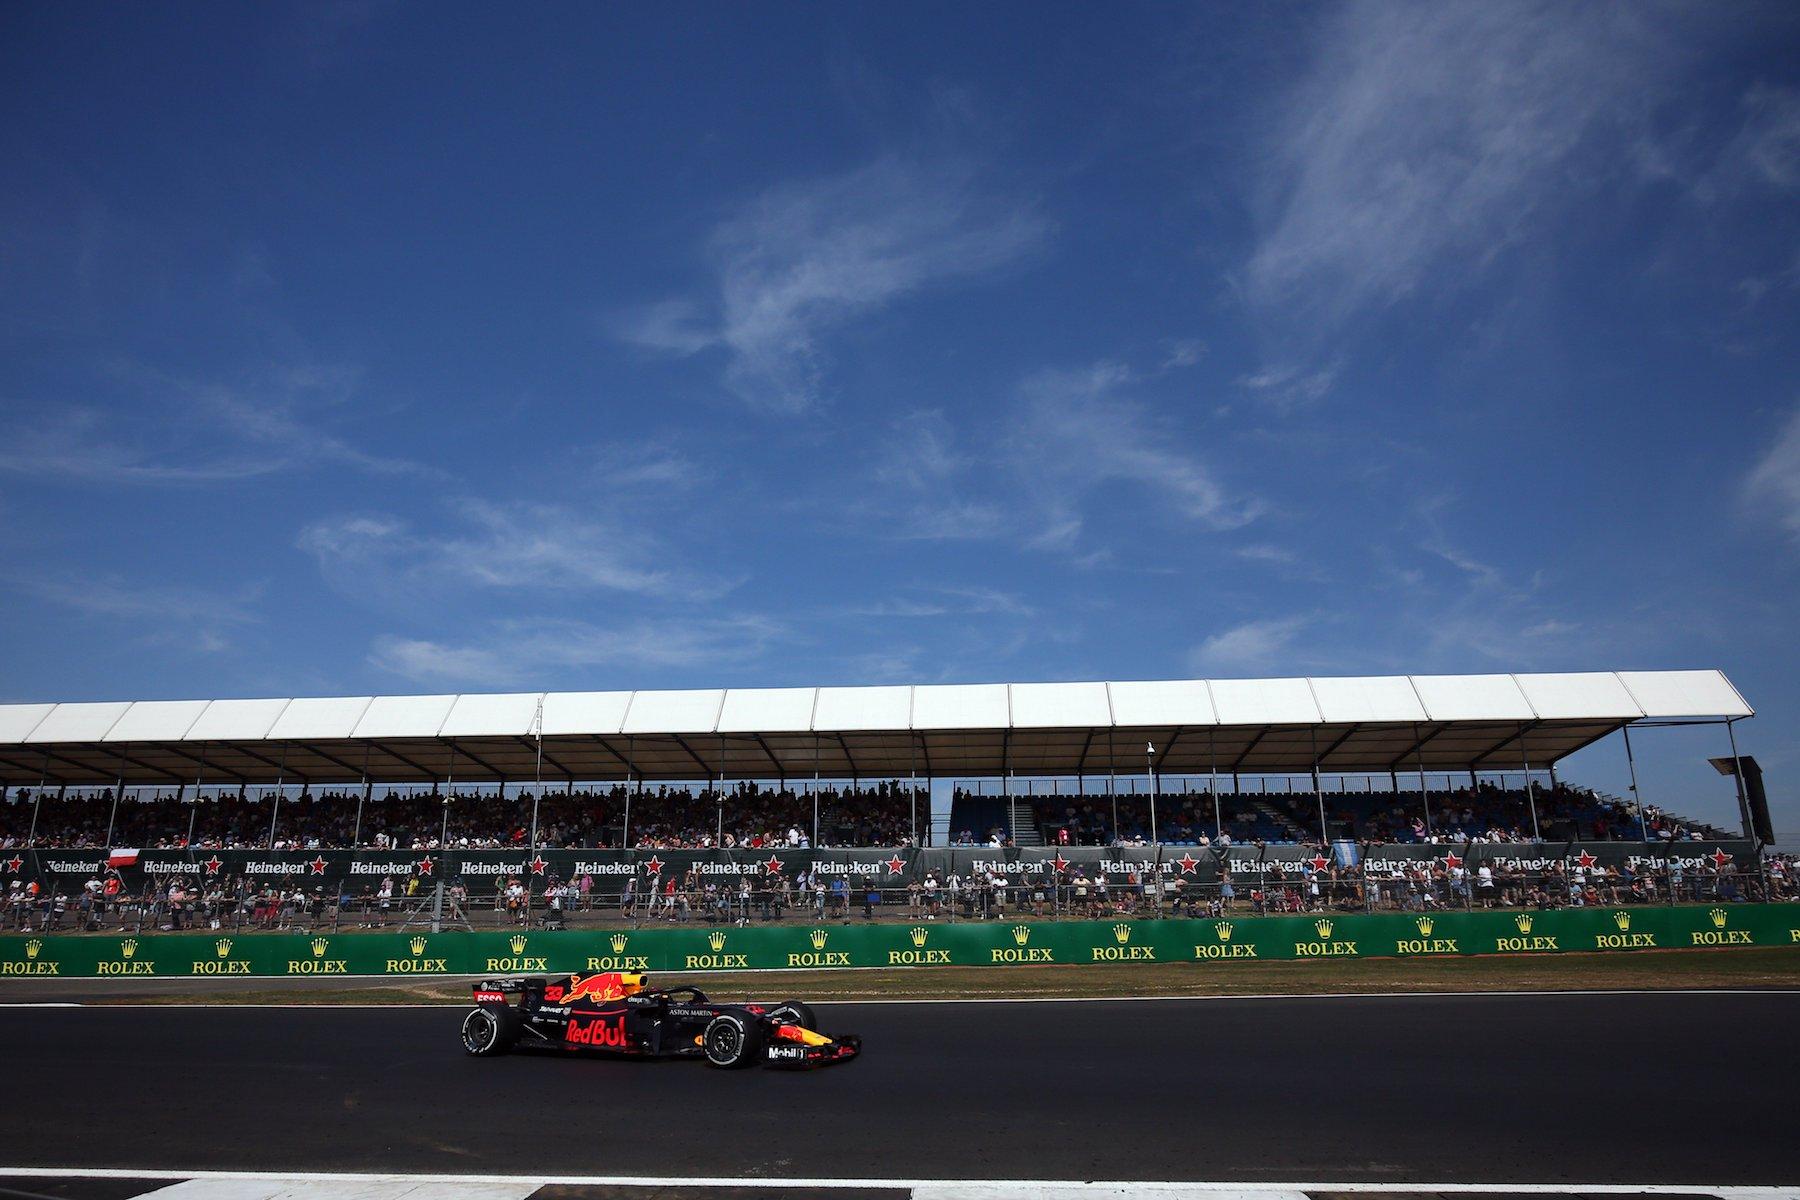 2018 Max Verstappen | Red Bull RB14 | 2018 British GP FP1 1 copy.jpg